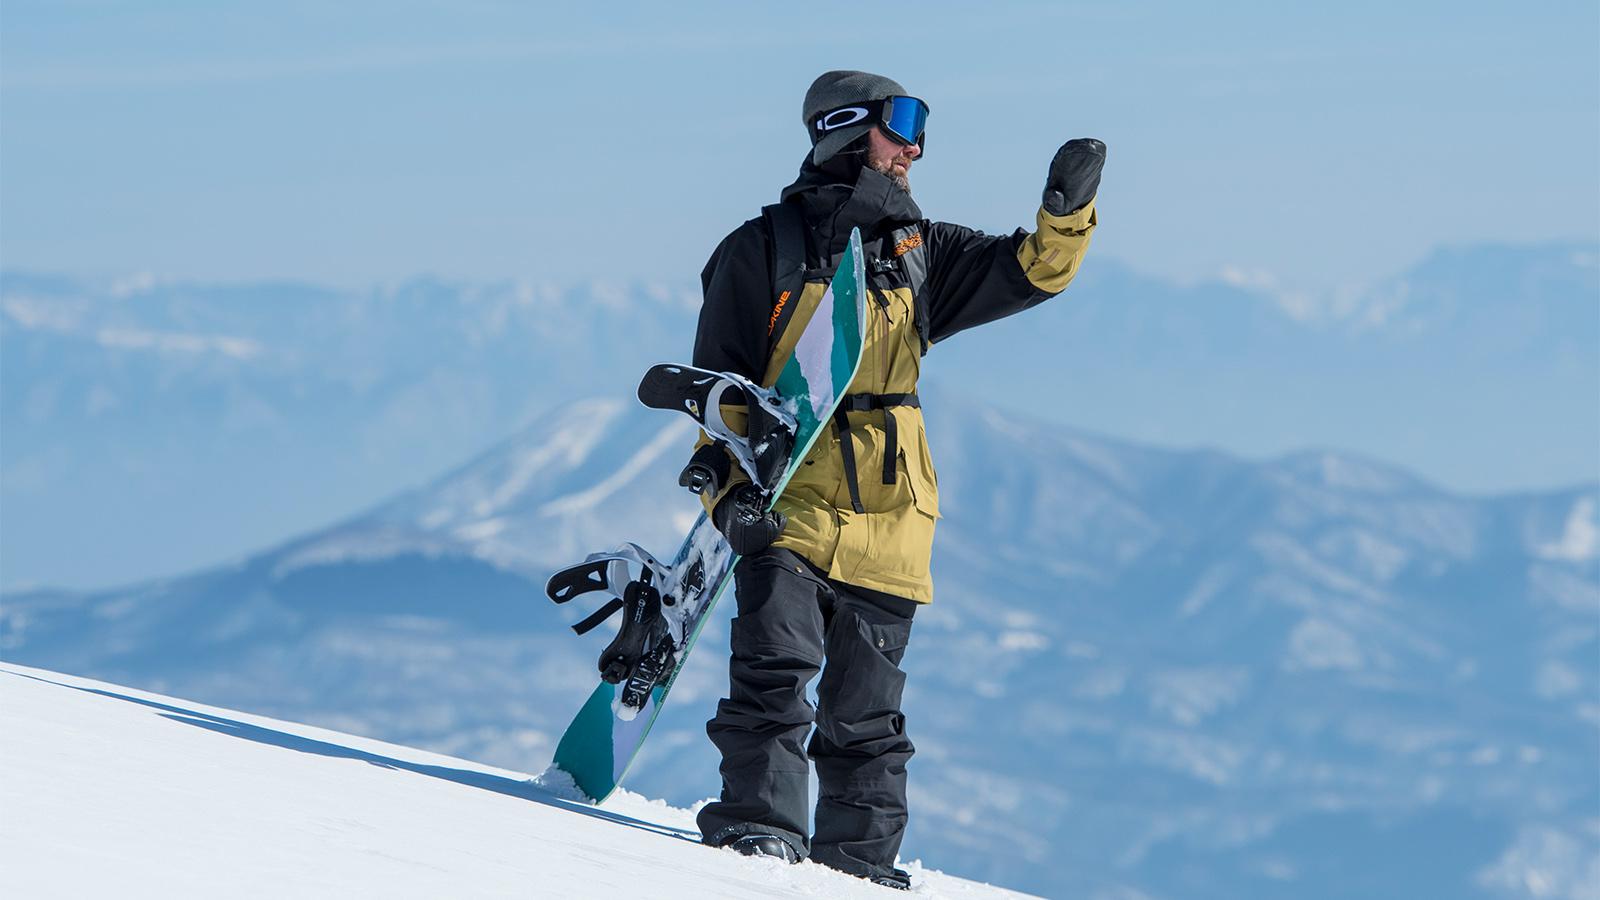 Now FW20/21 Snowboard Bindings